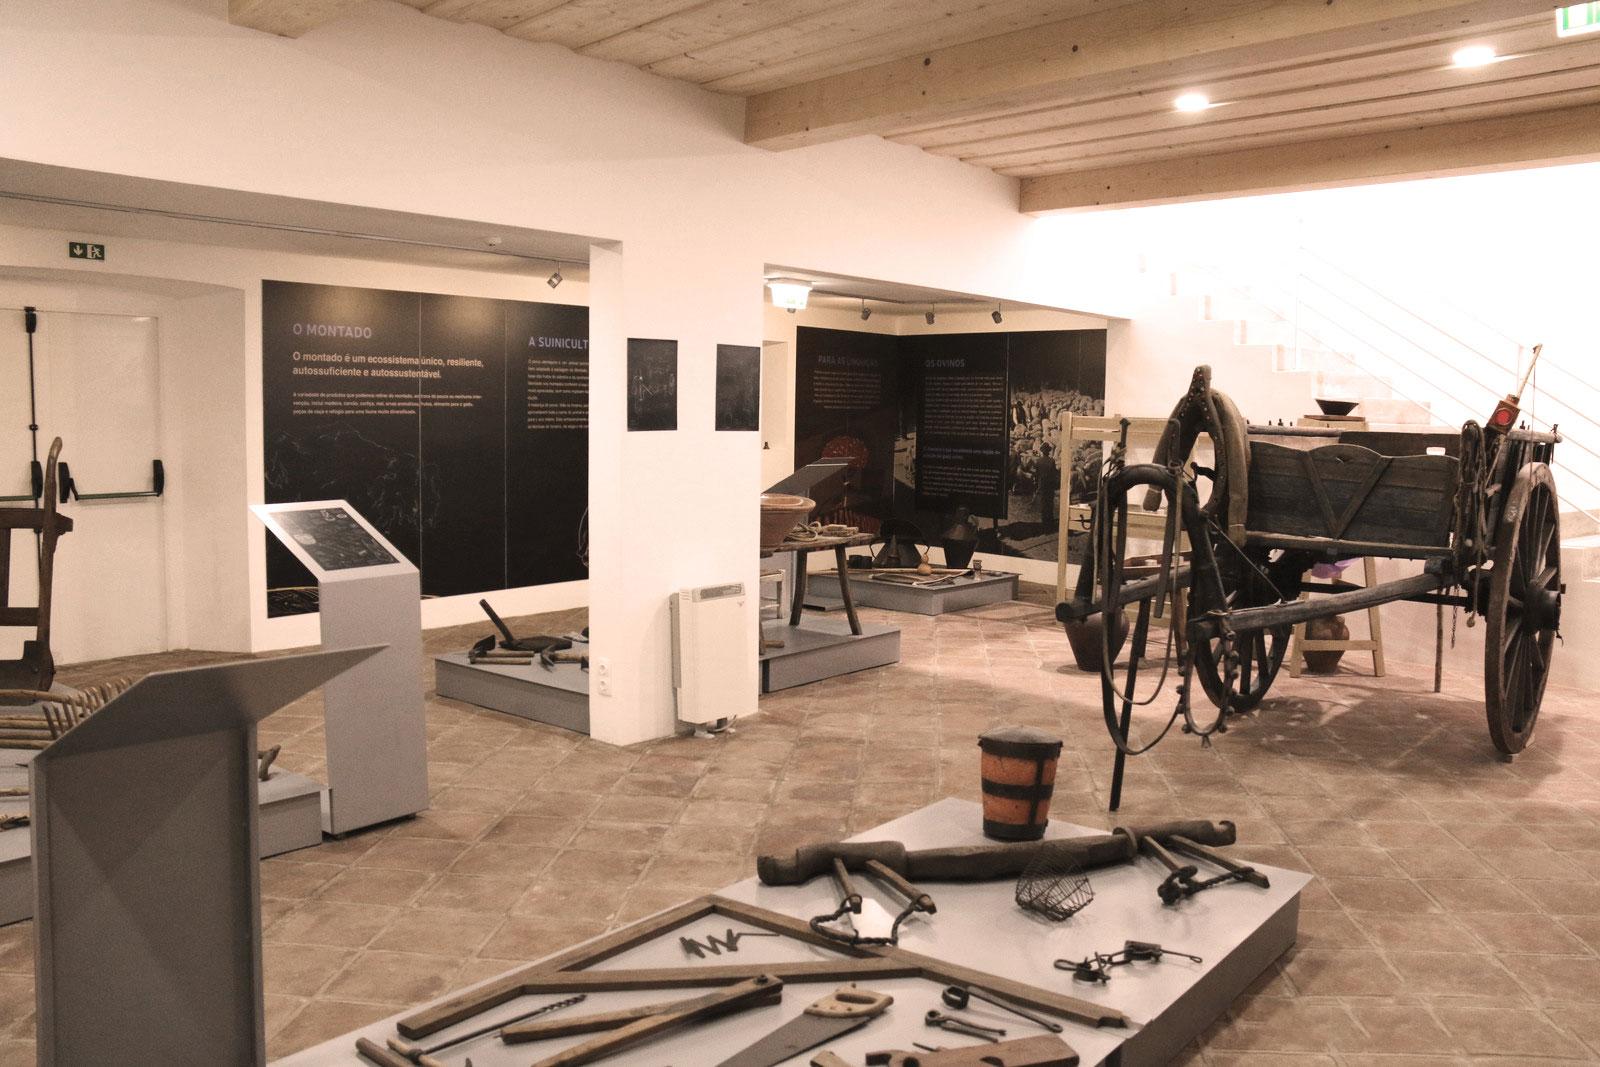 Centro de Etnologia - Museu Local (CMMN, 2019)